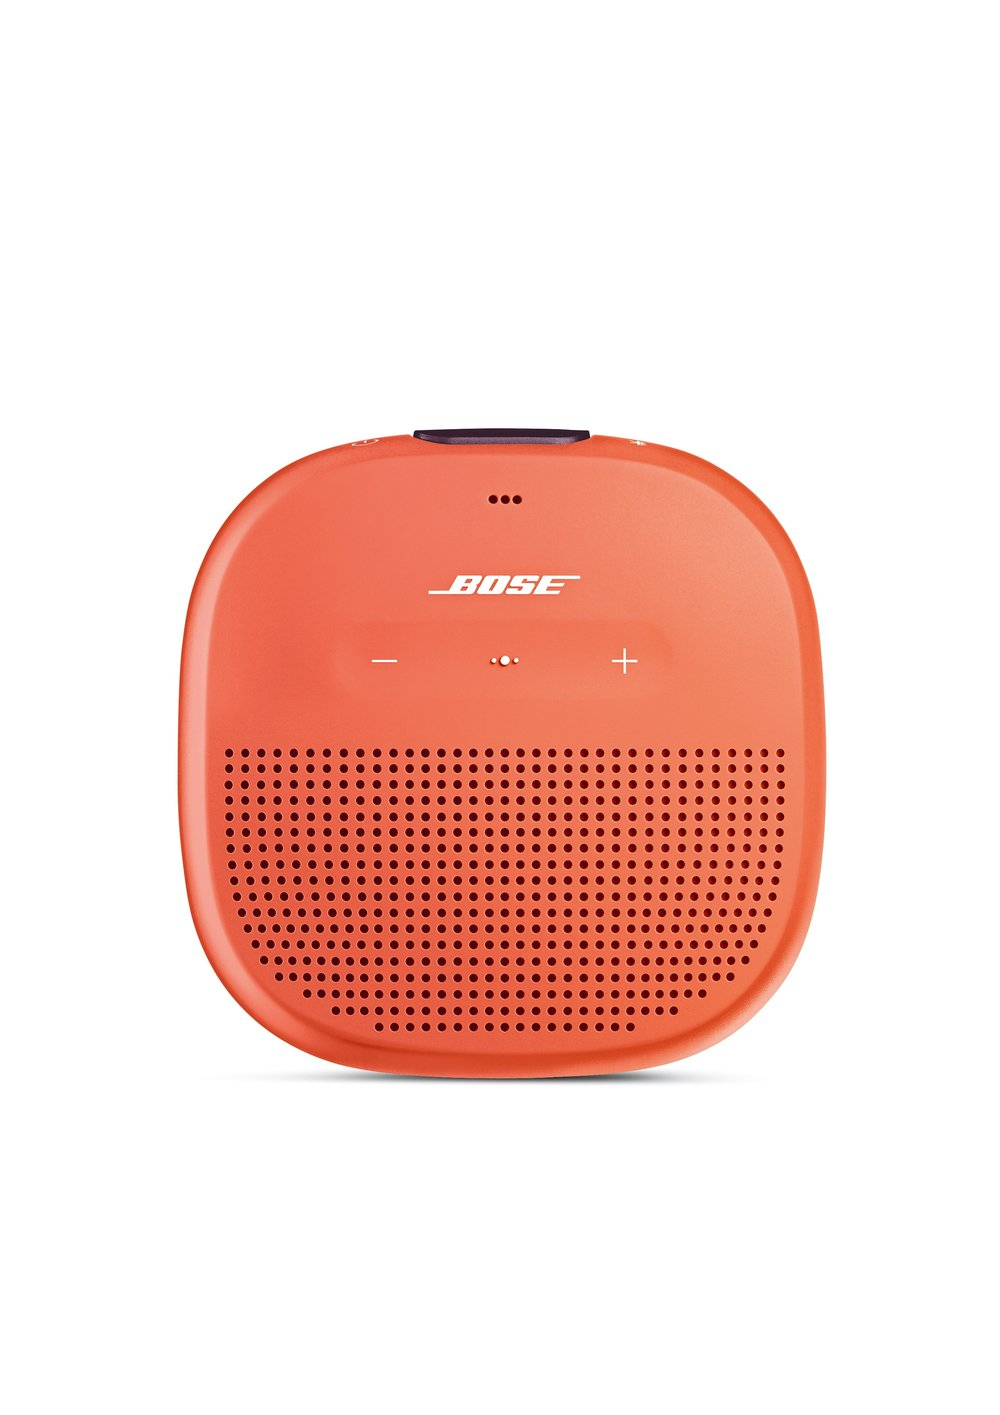 SoundLink Micro speaker